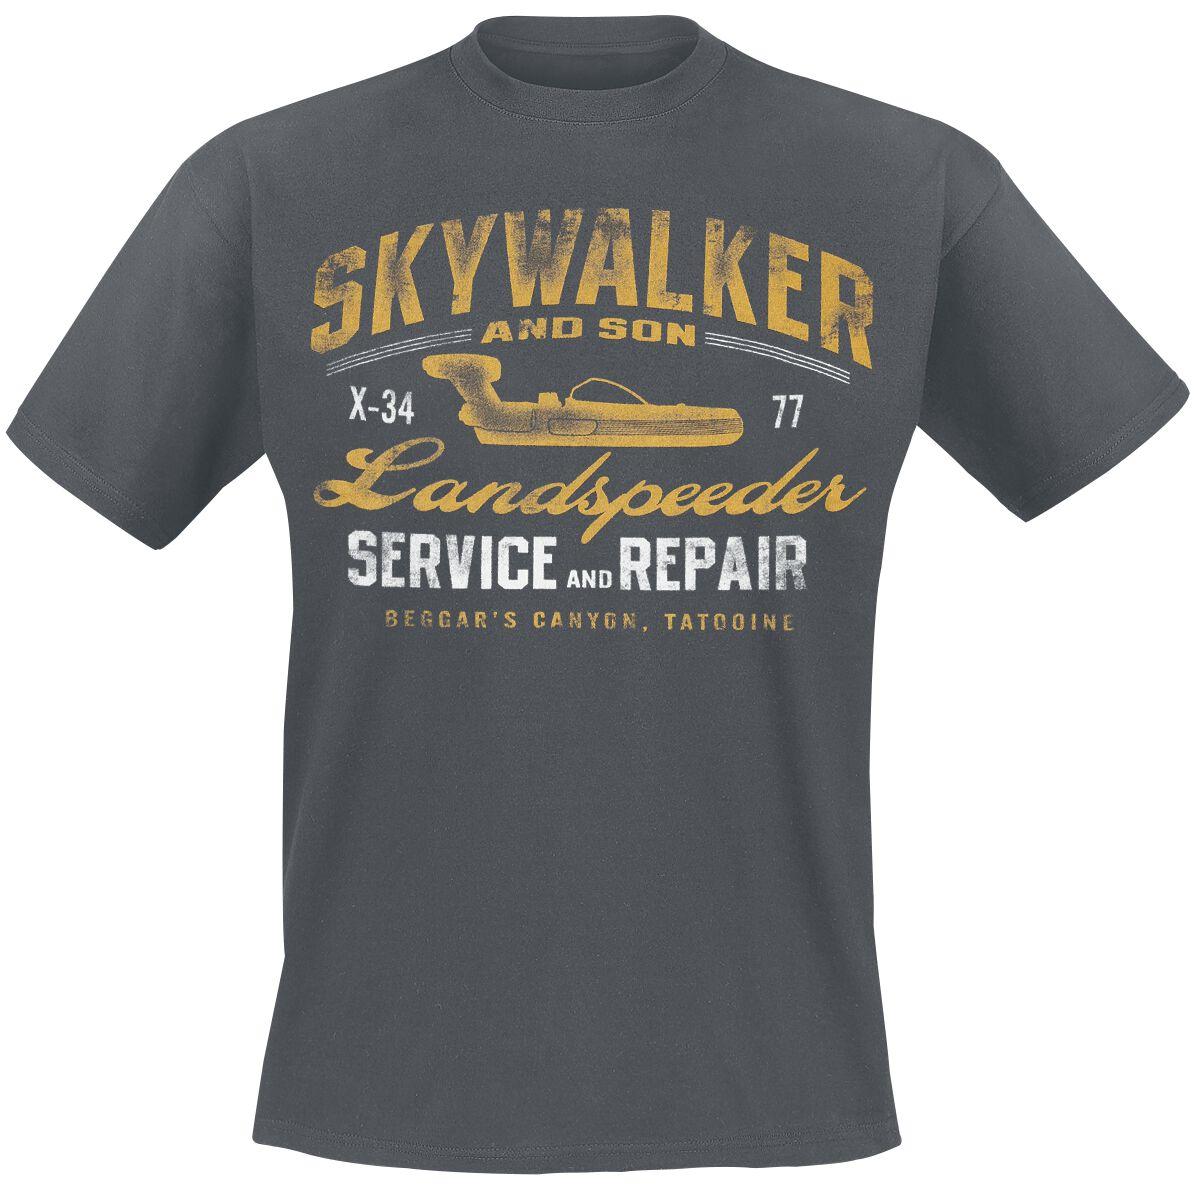 Star Wars Landspeeder Repair T-Shirt grau